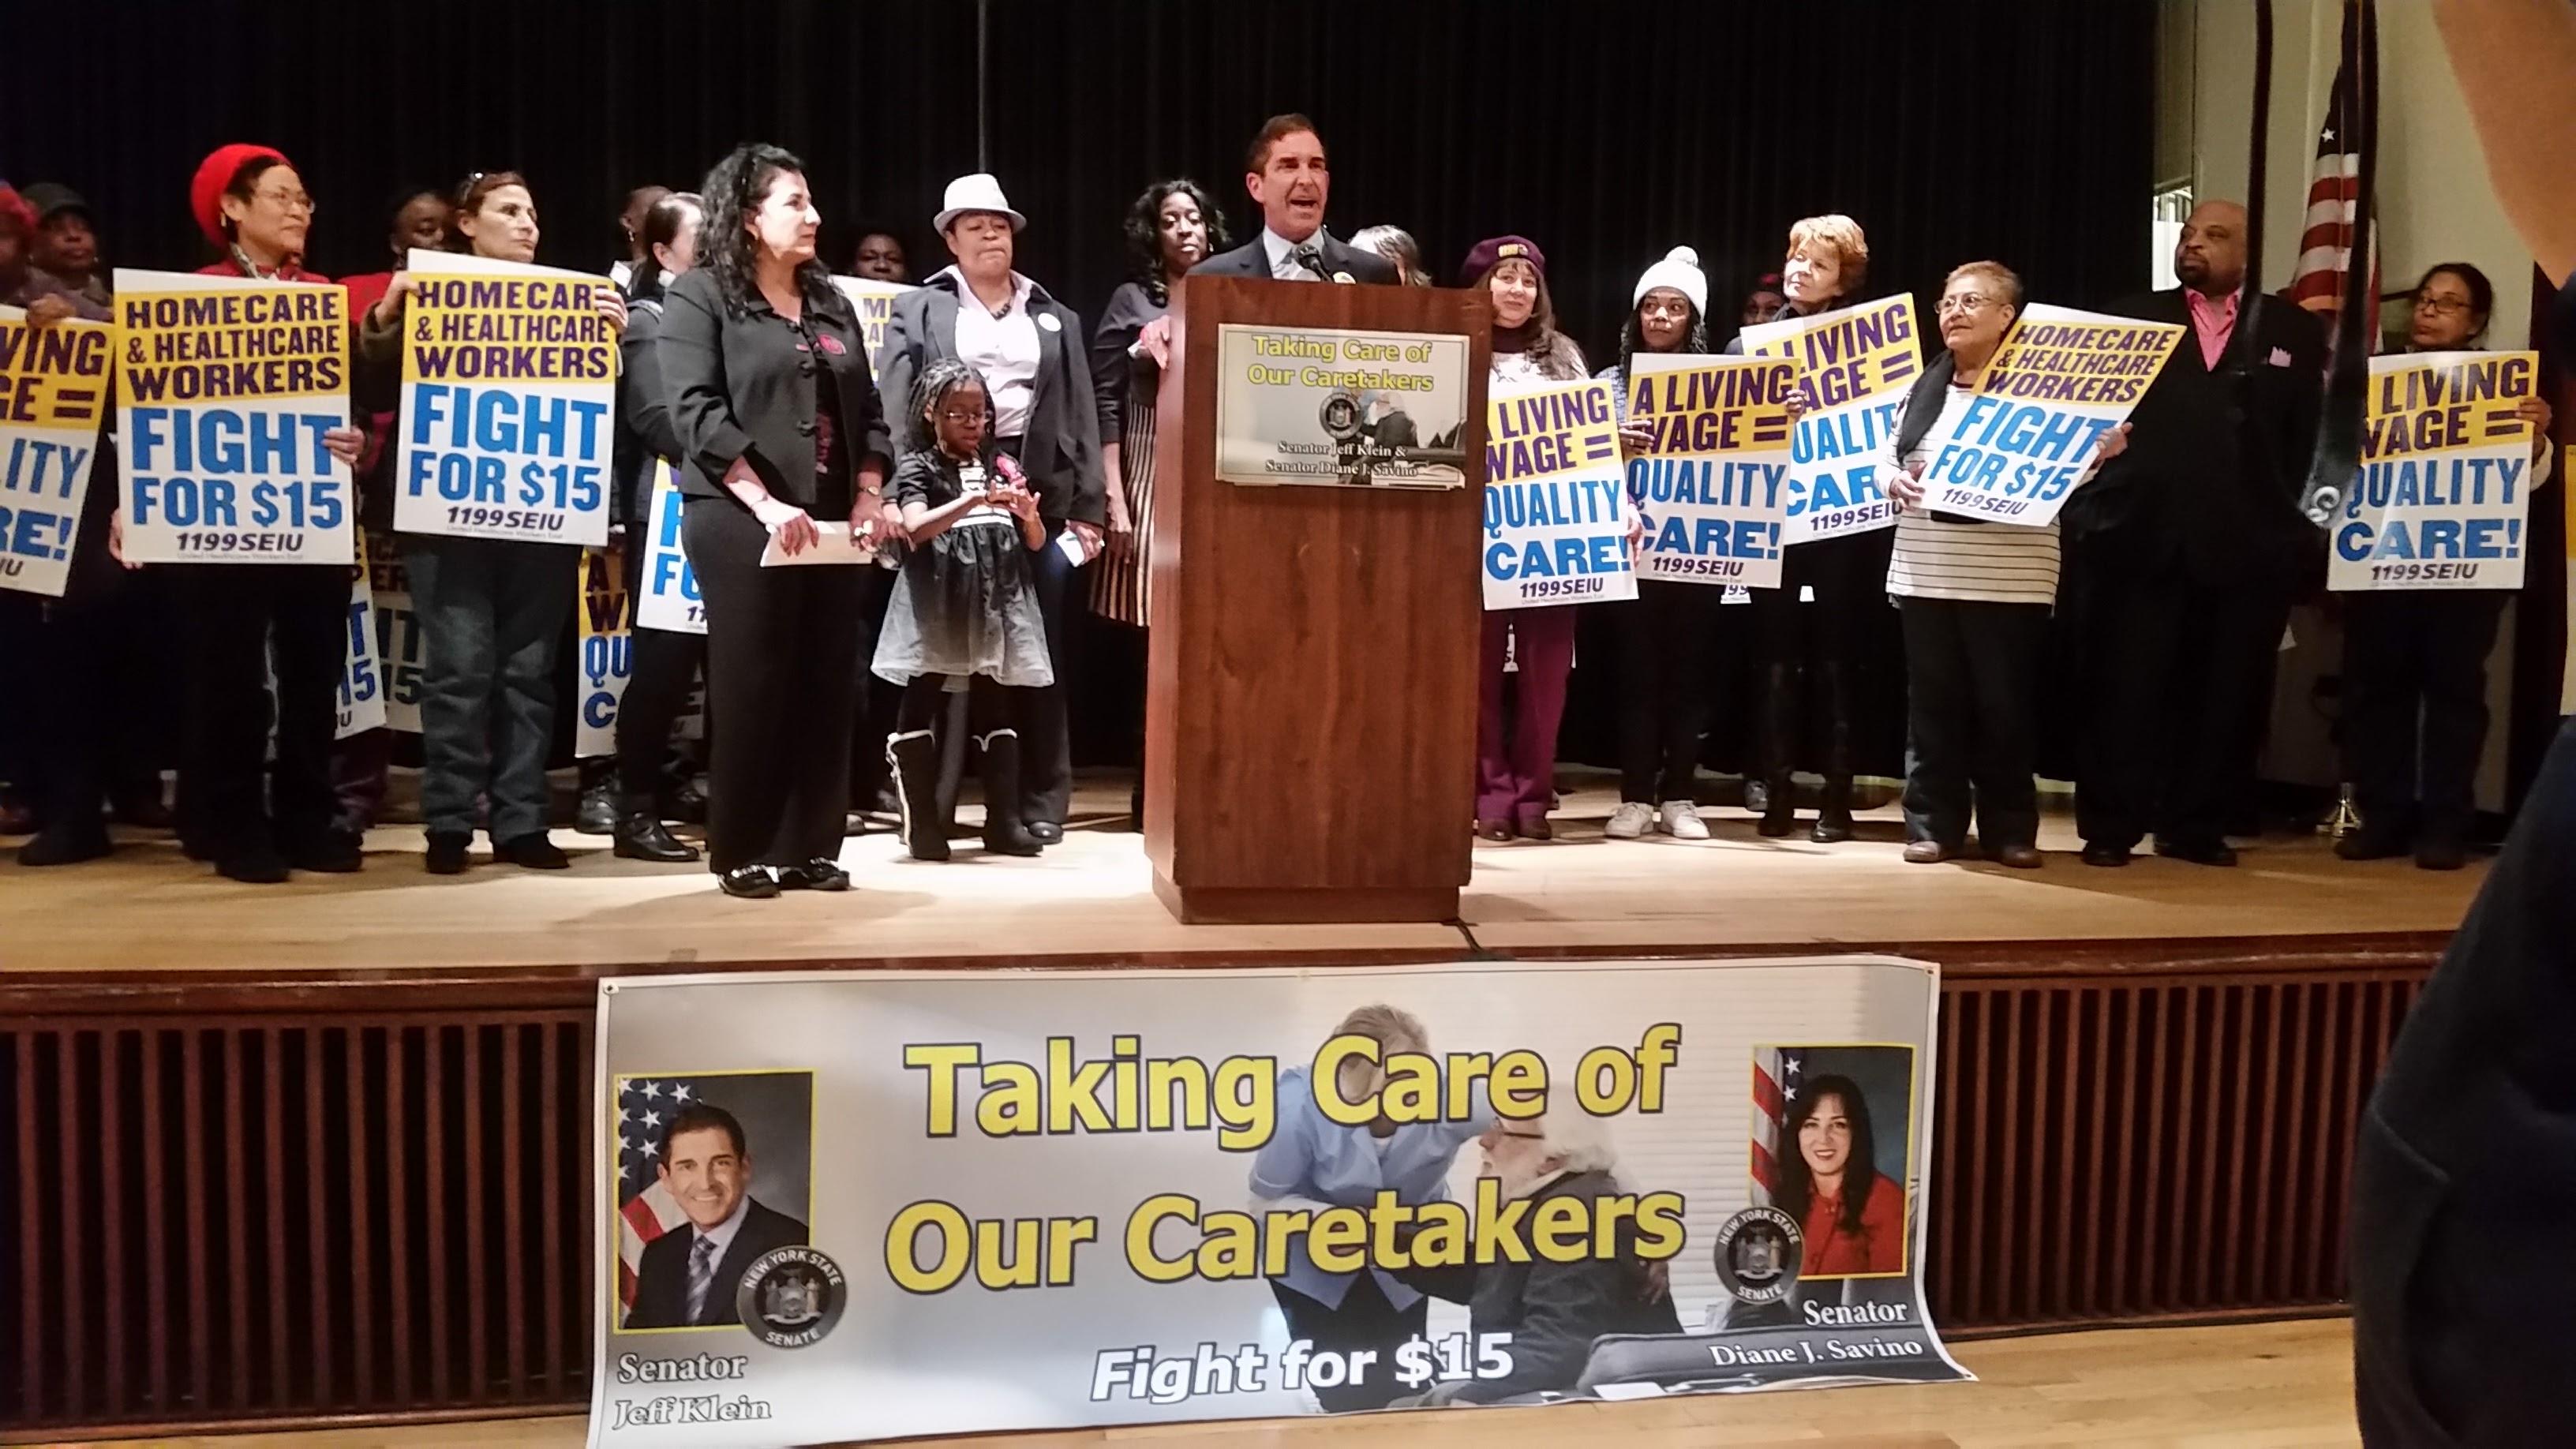 "Senators Klein & Savino Rally with 1199 SEIU to ""Fight For $15"" for Caretakers"